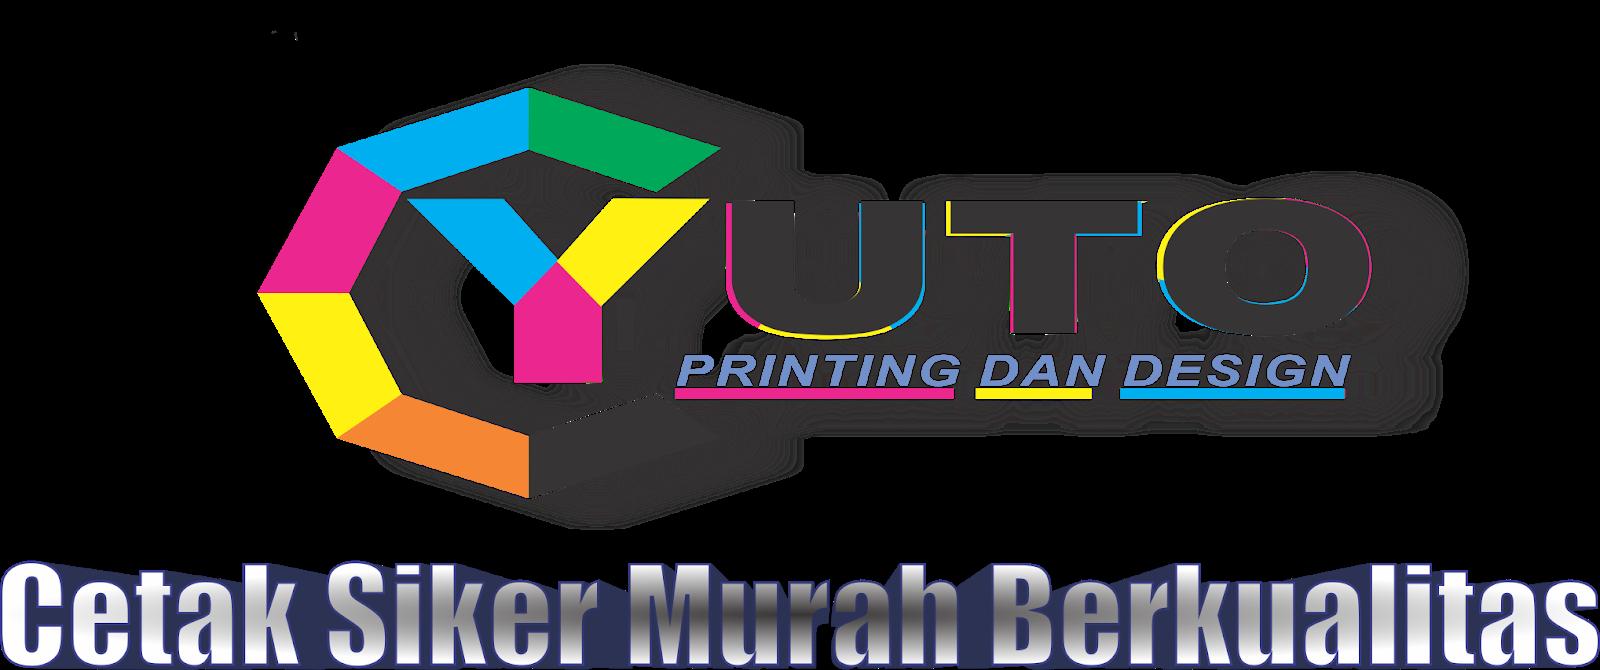 Cetak Stiker Murah Berkualitas Jakarta Timur Sebagai Tempat Pastinya Kami Memberikan Hasil Yang Kepada Setiap Pelanggan